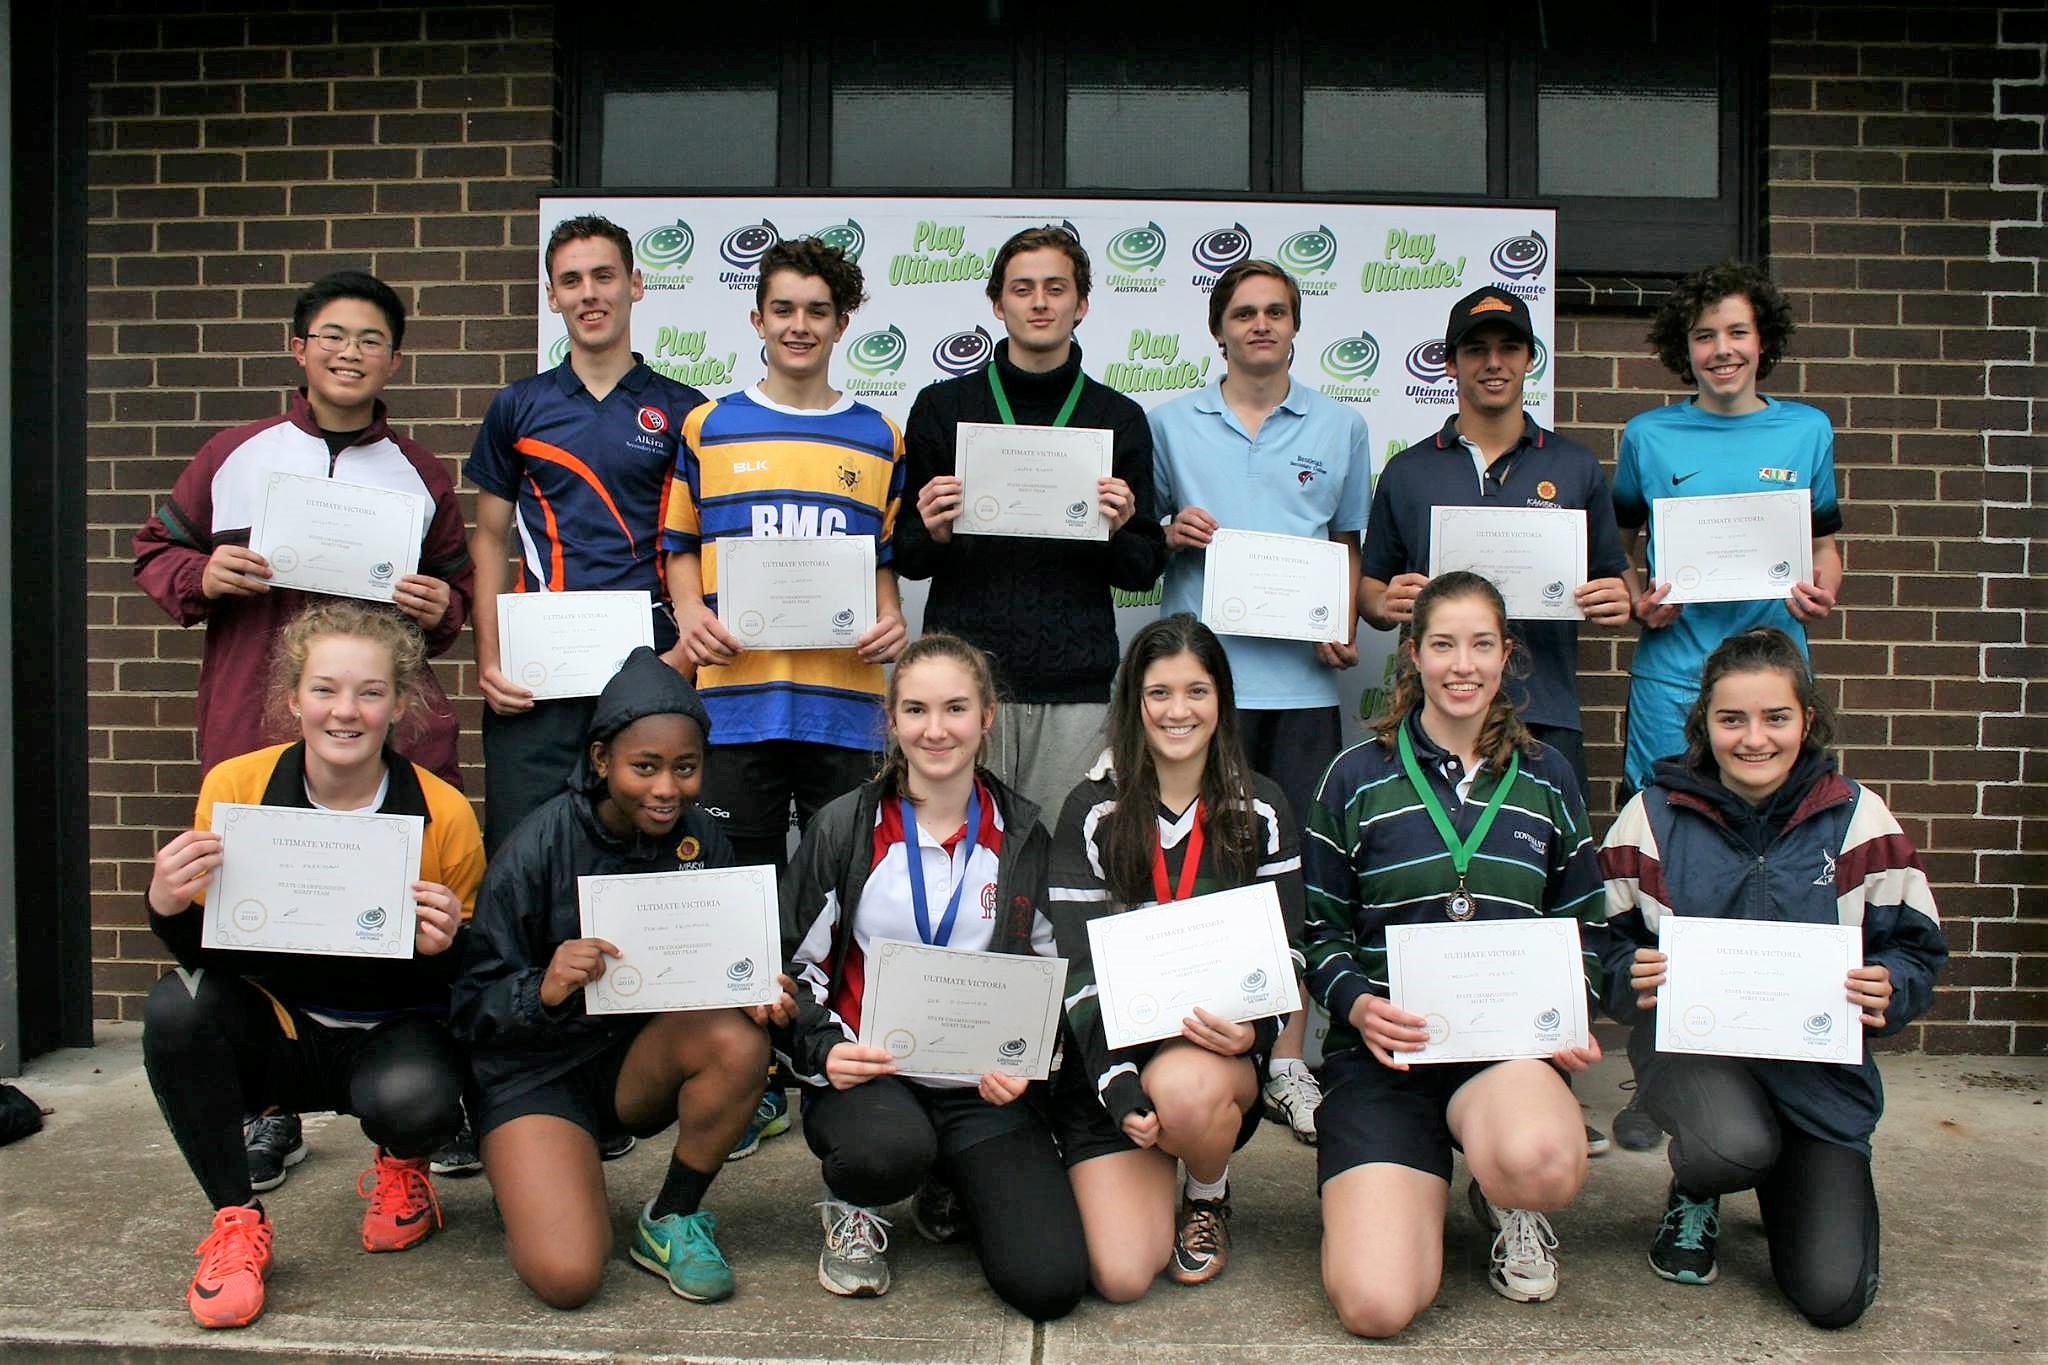 High School State Championships (HSSC)